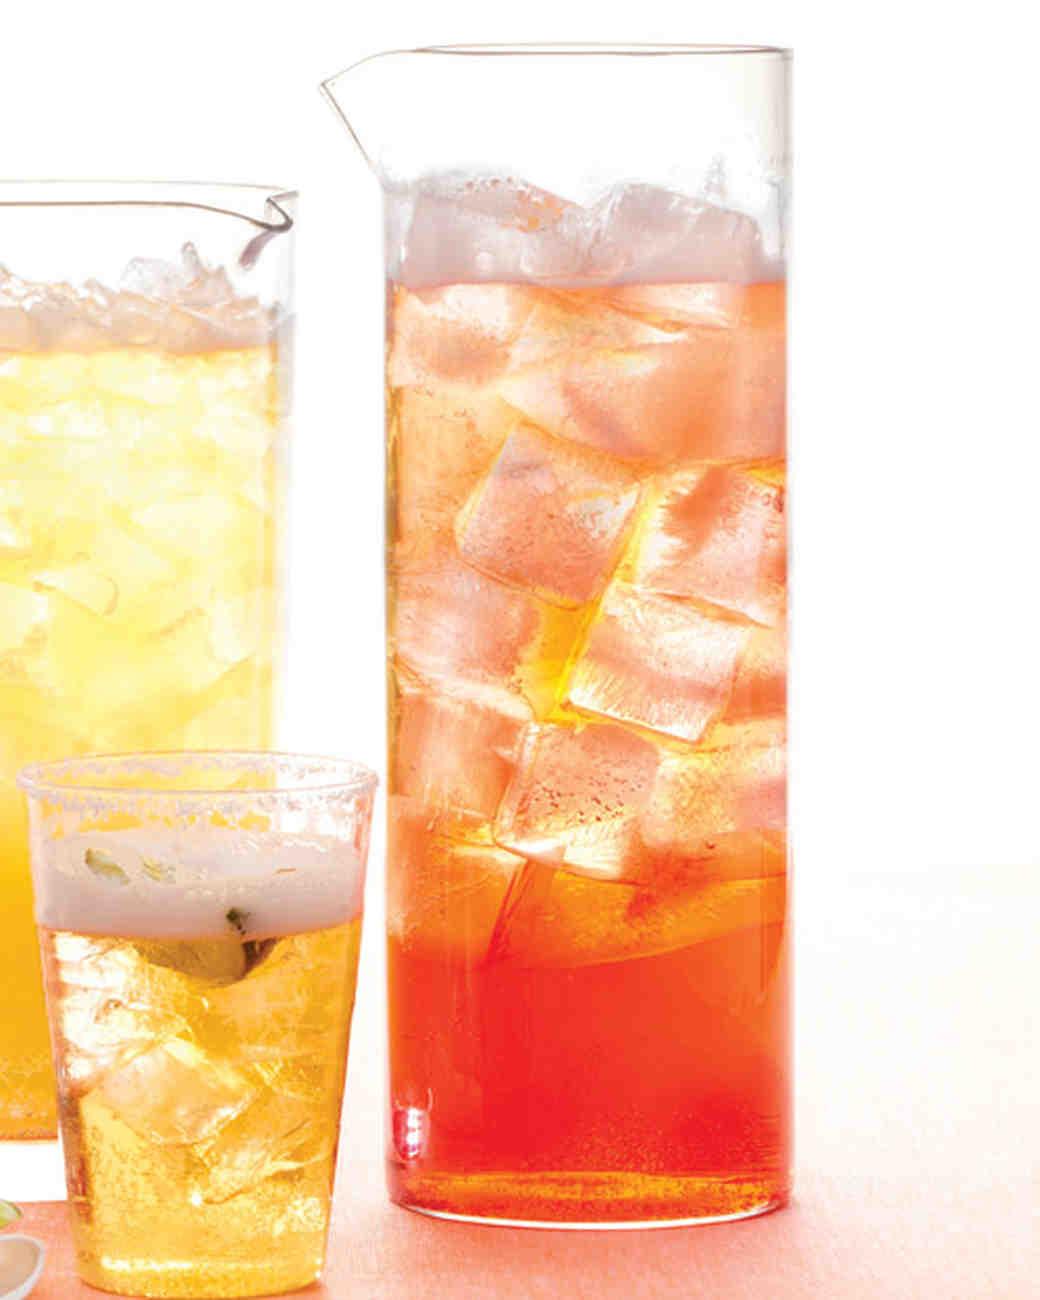 mld105716_0610_cherry_beer.jpg